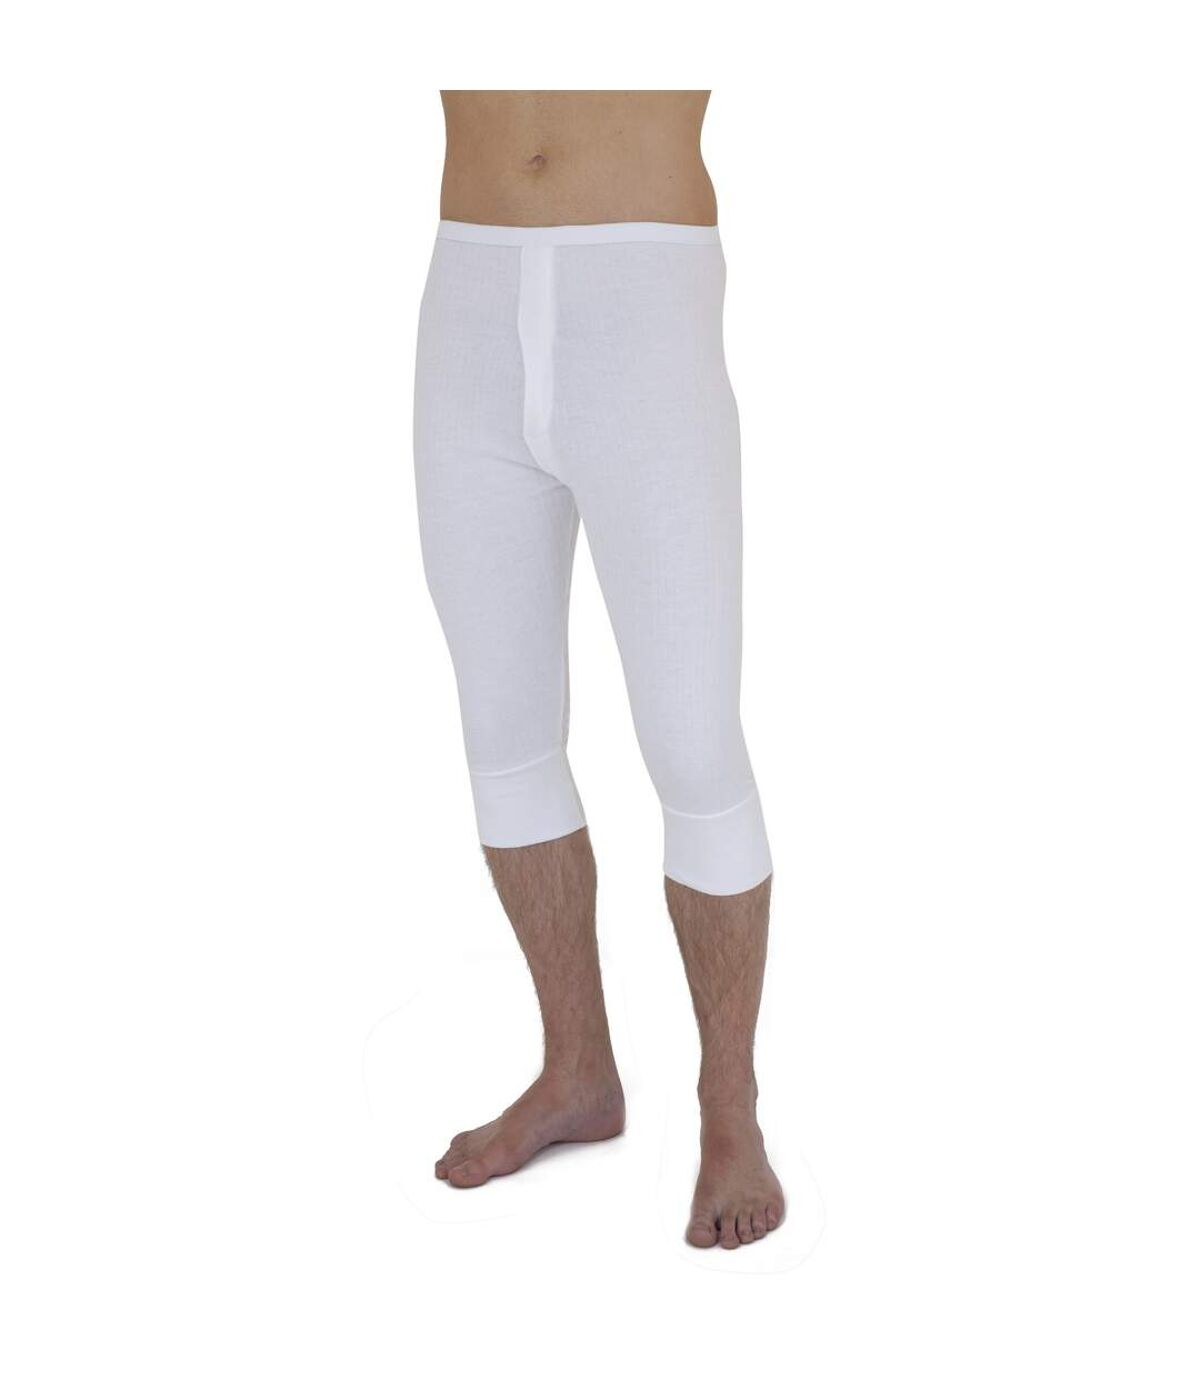 Mens Thermal Underwear 3/4 Length Long Johns Polyviscose Range (British Made) (White) - UTTHERM14